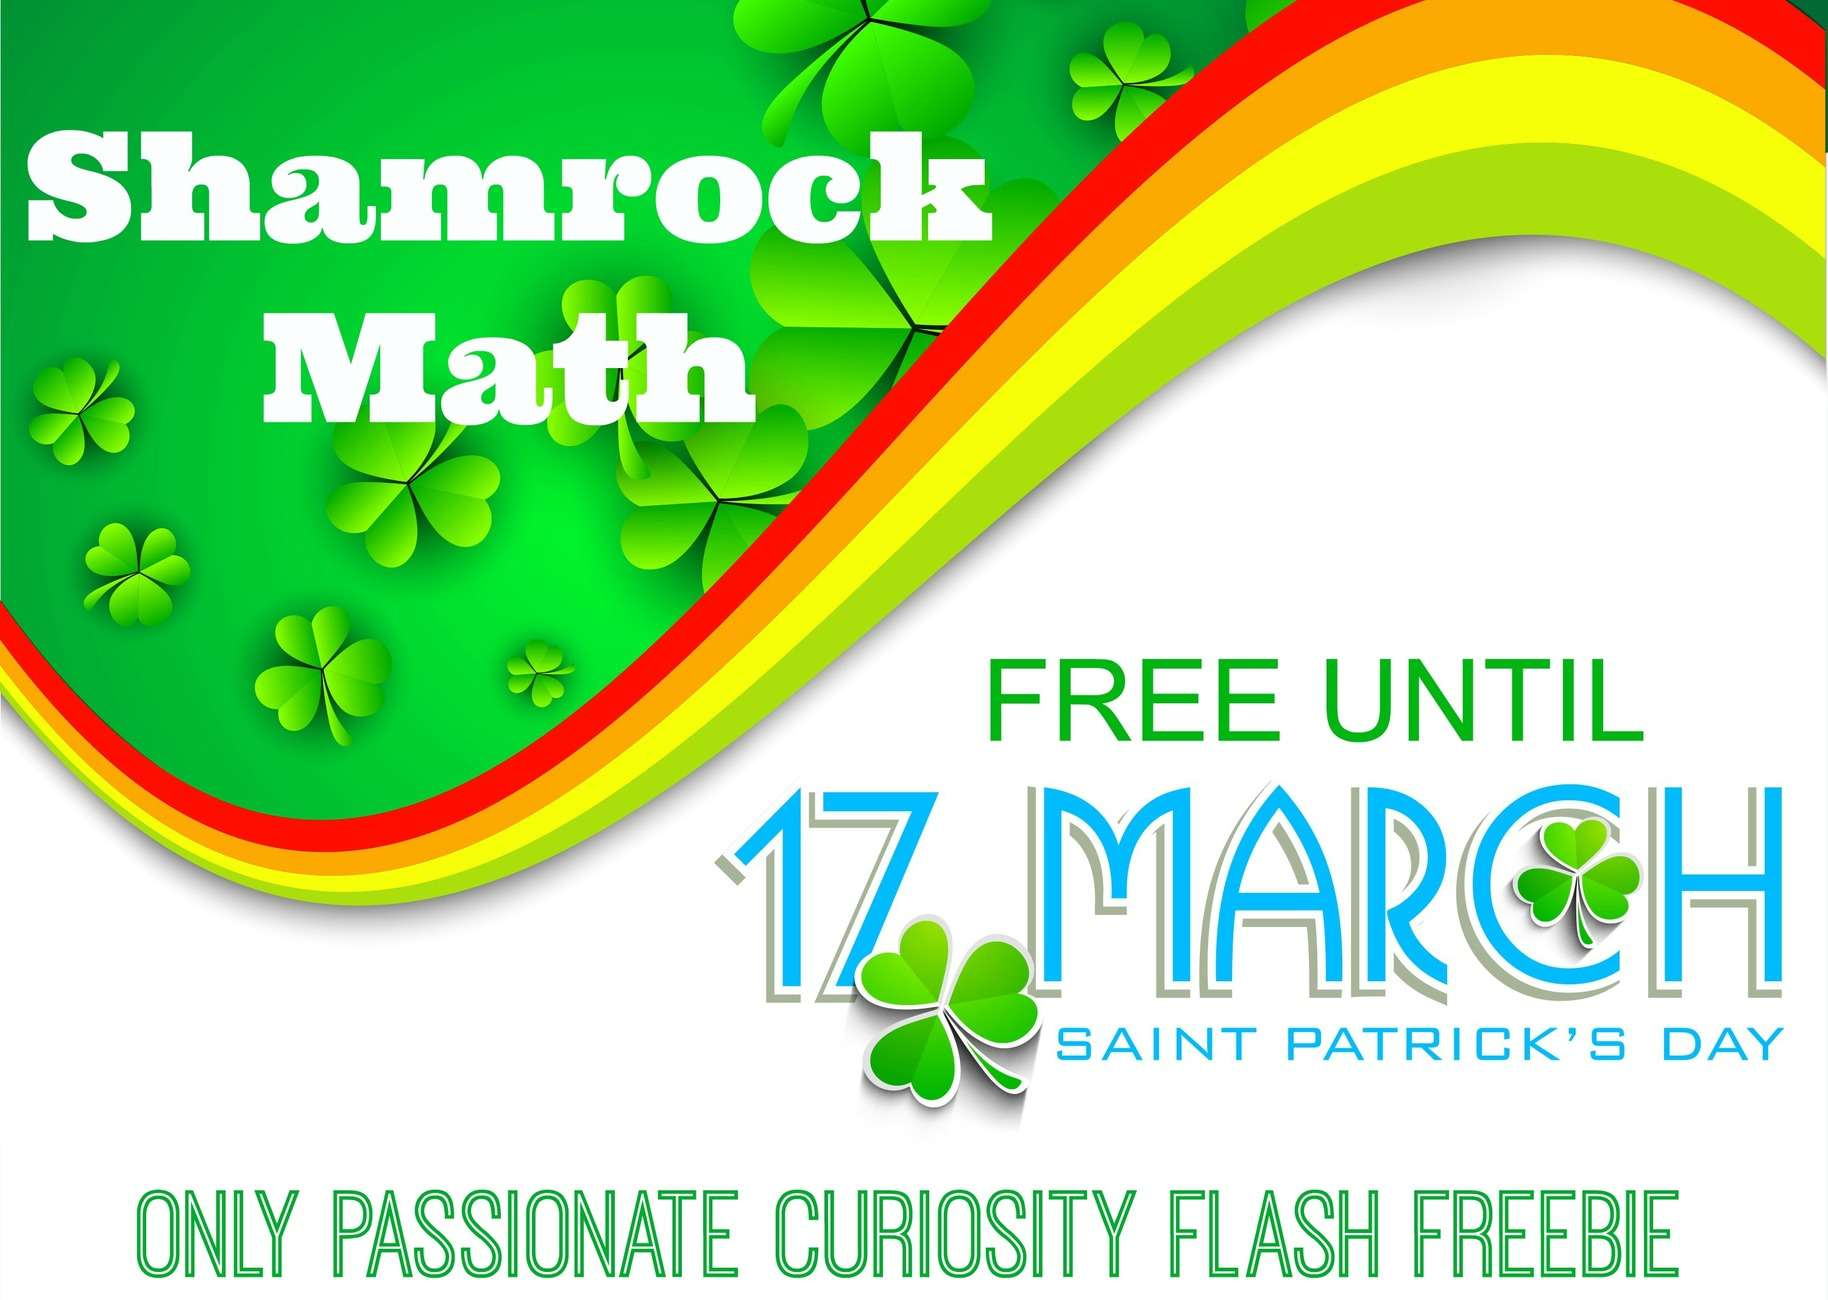 Happy Saint Patrick's Day! Flash Freebie!